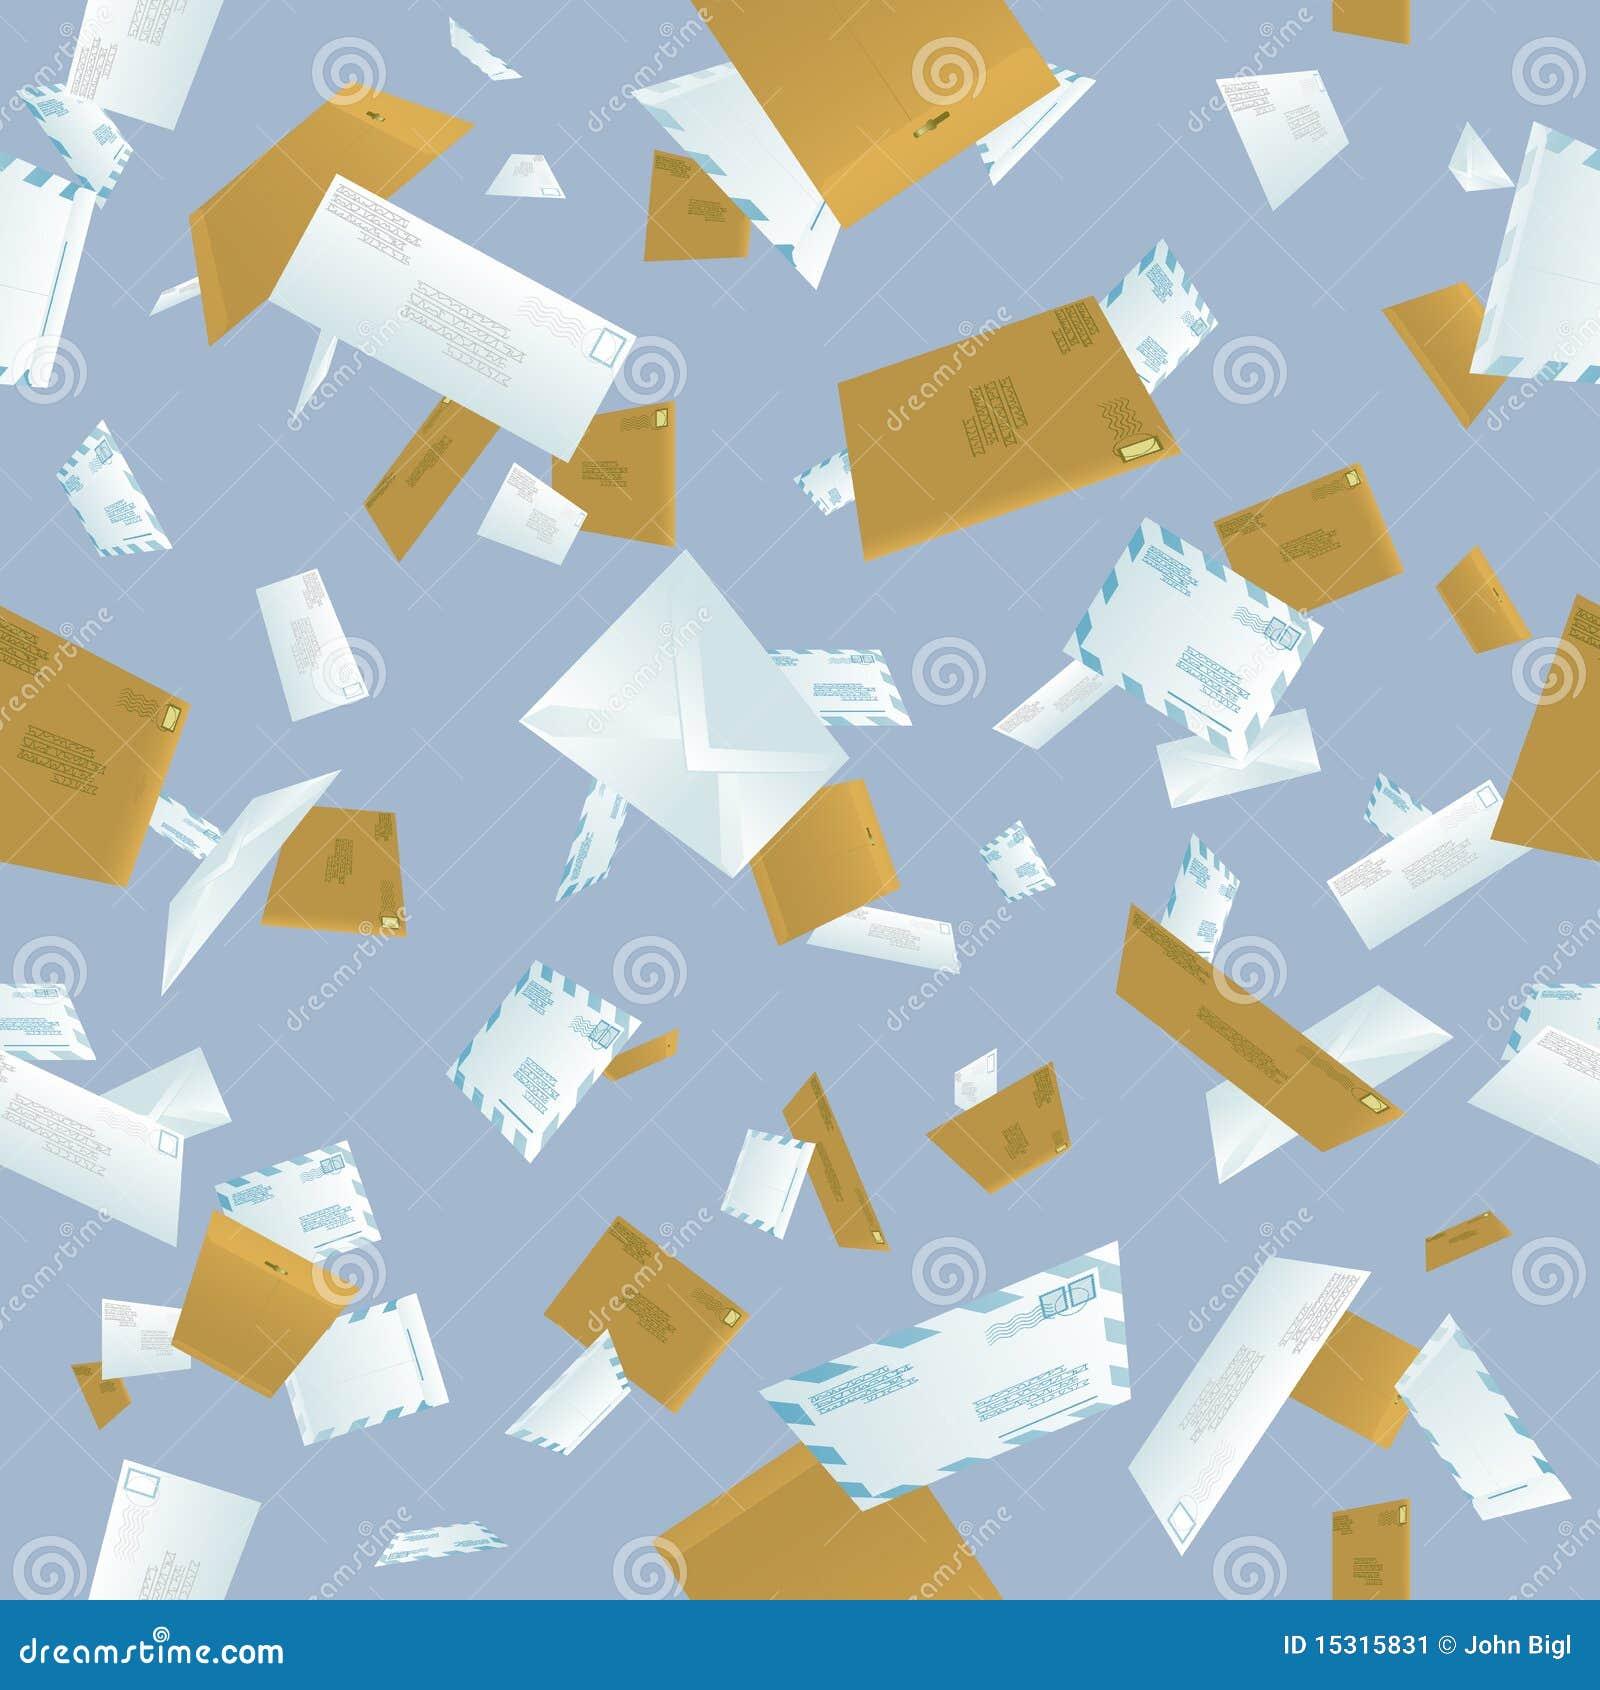 Seamless Tumbling Mail Background Stock Image - Image: 15315831